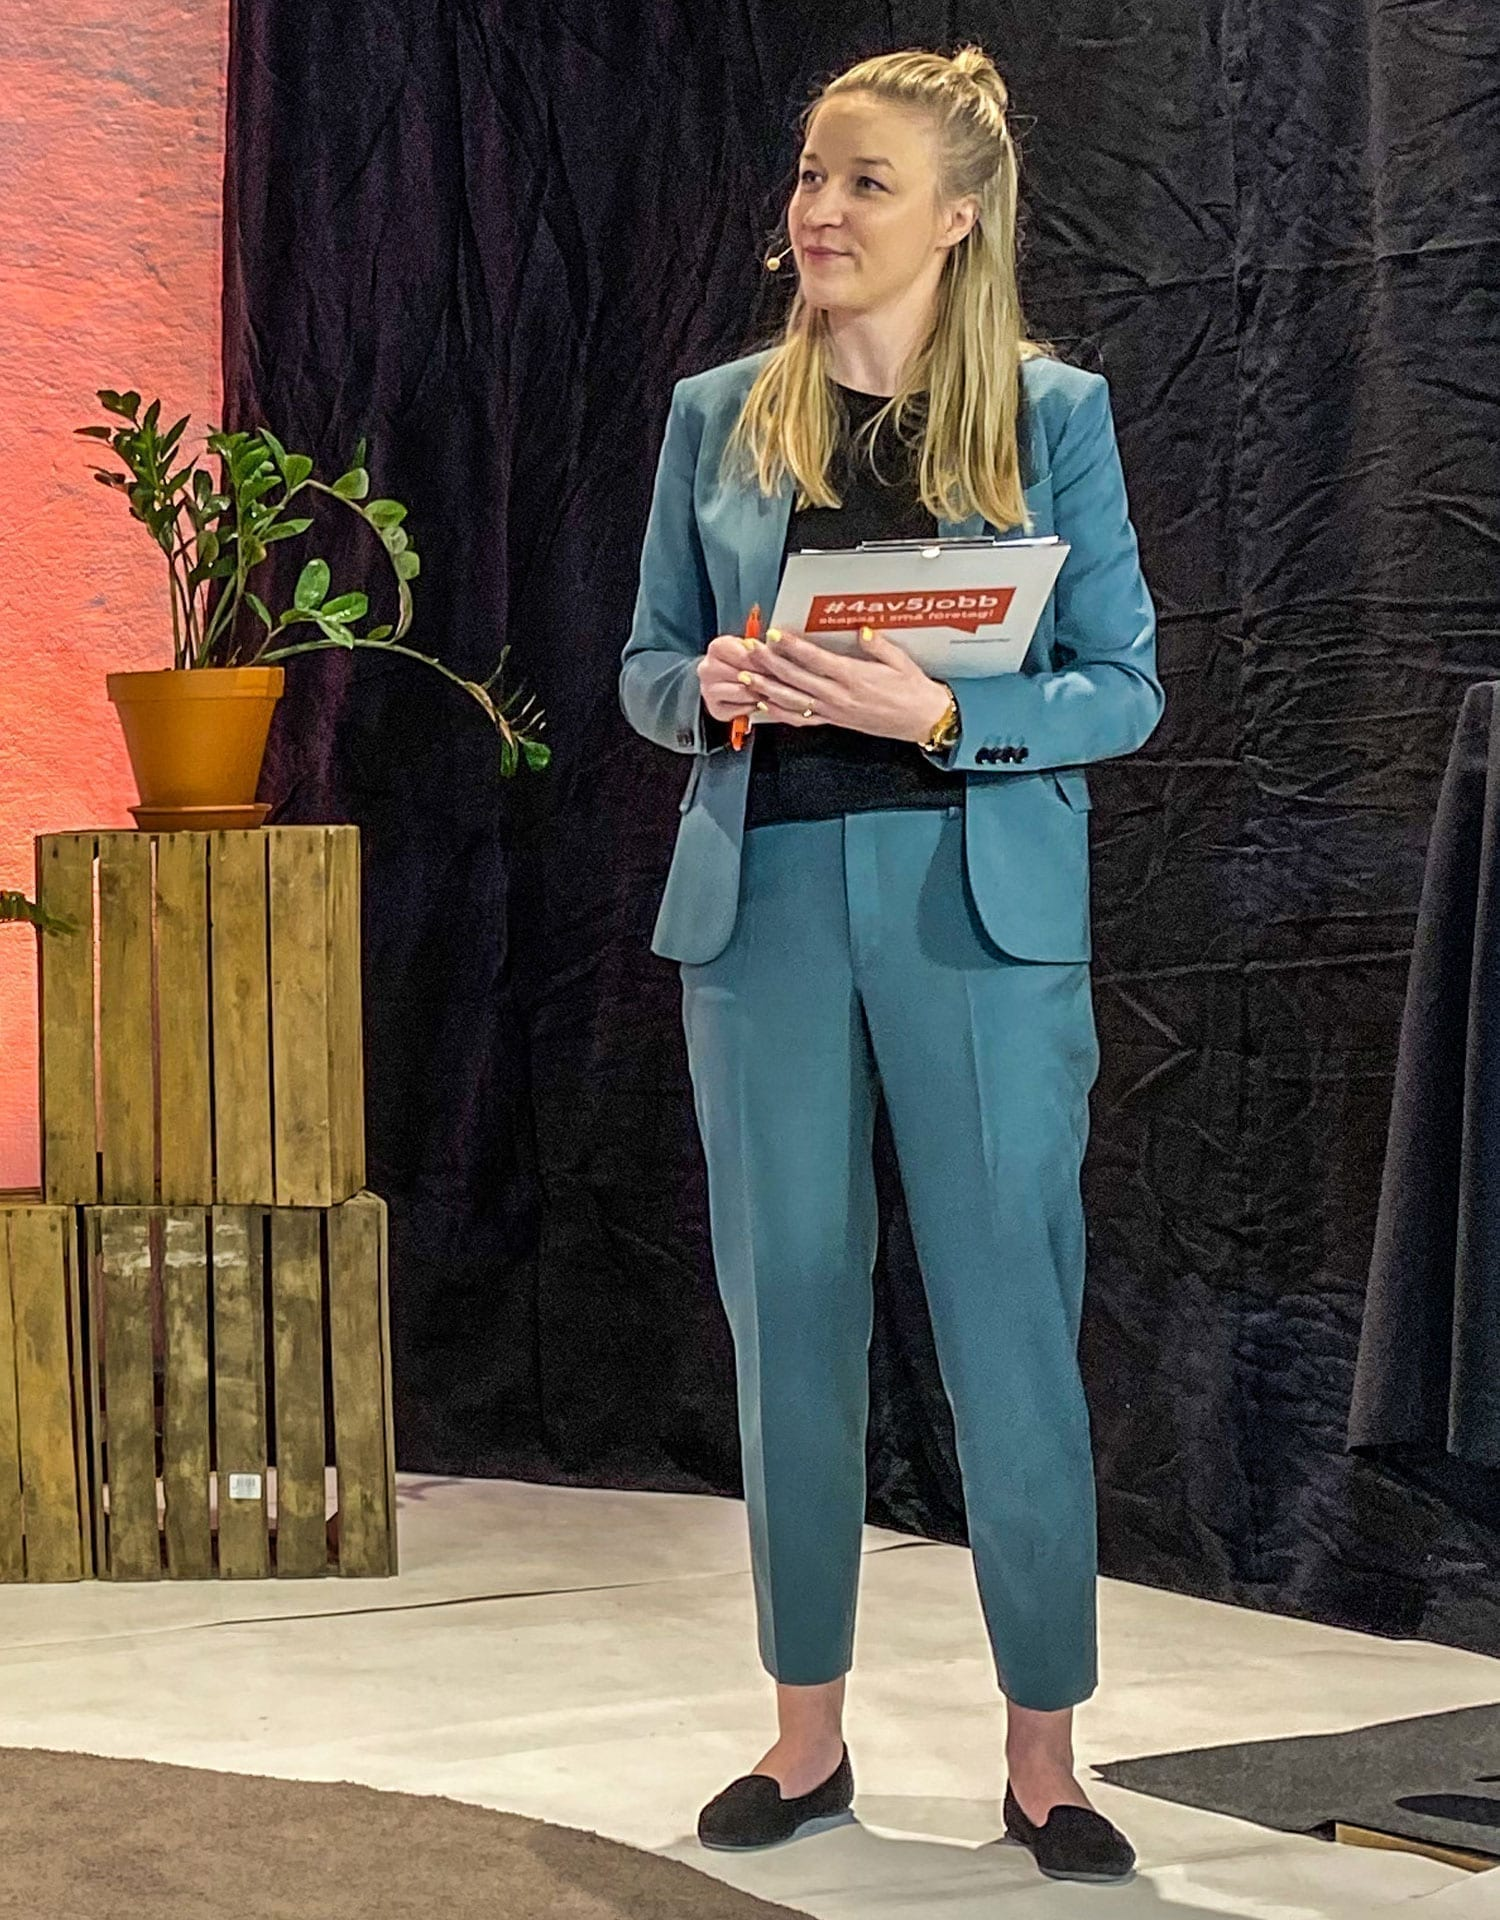 Amanda Svensson